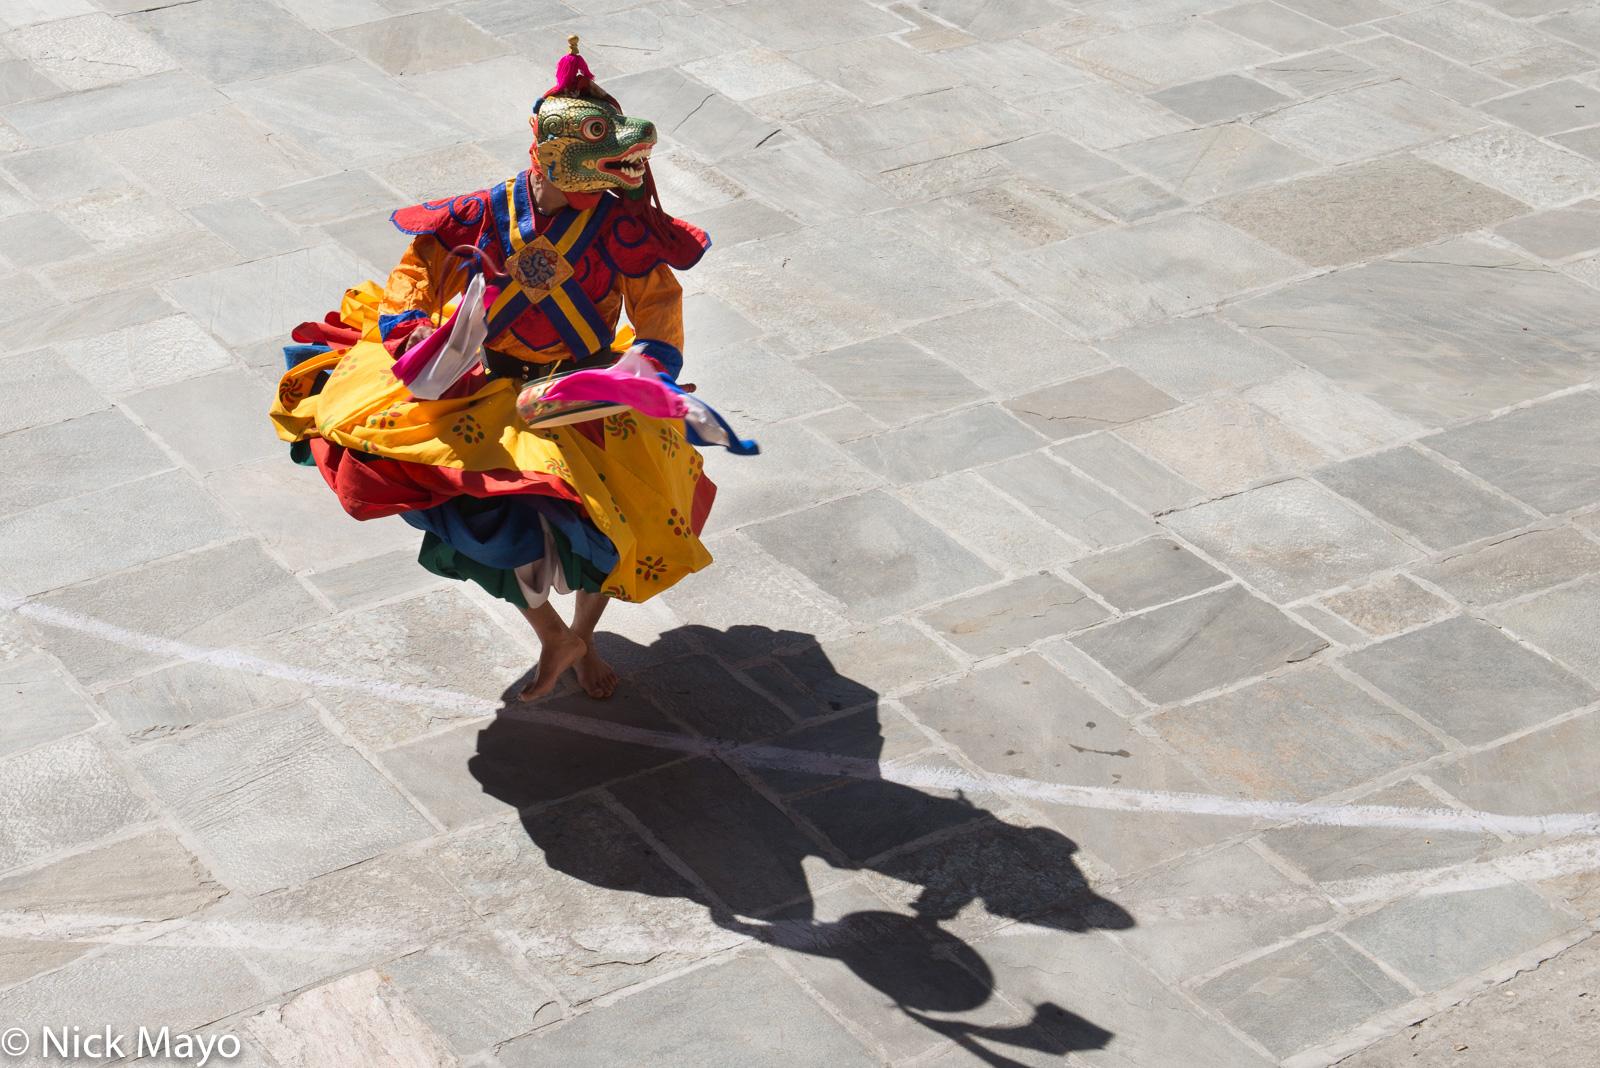 Bhutan,Dancing,East,Festival,Mask,Monk, photo